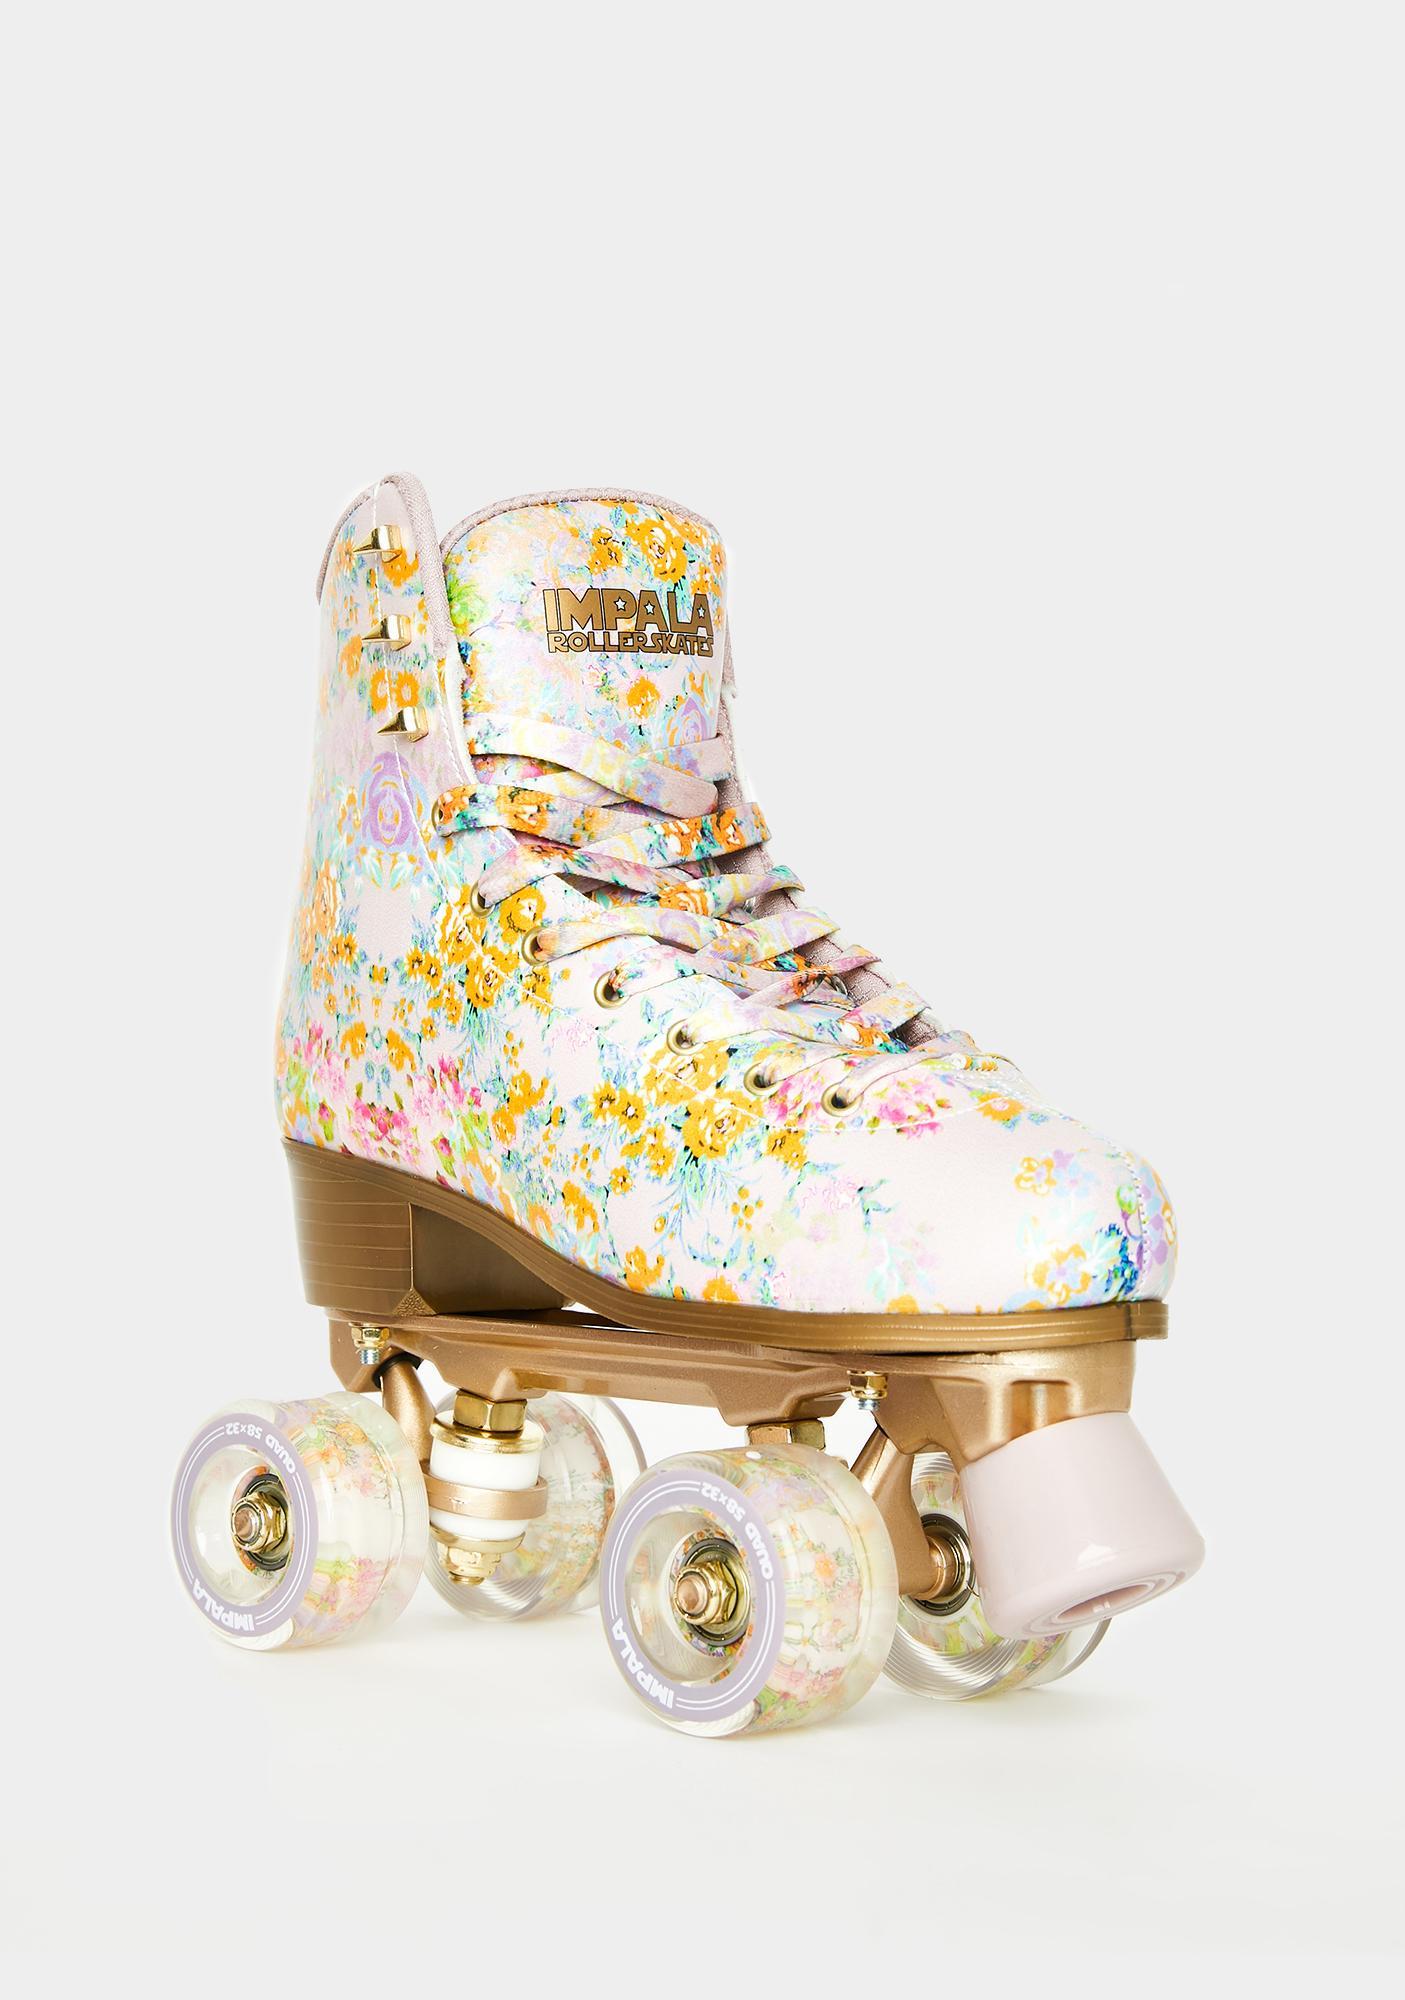 Impala Rollerskates Cynthia Rowley Floral Roller Skates